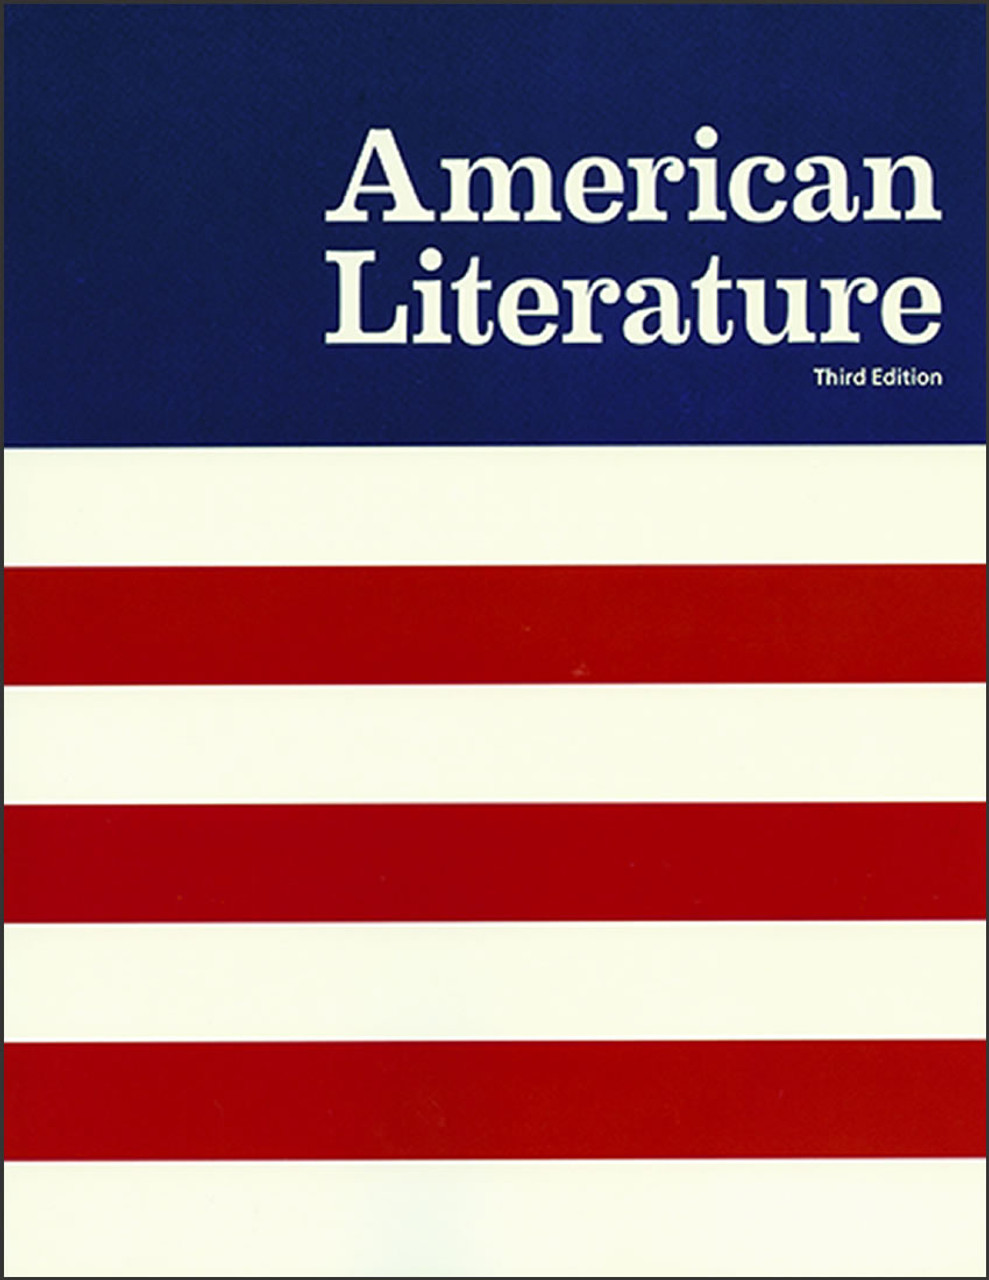 American Literature, 3rd edition (first half)